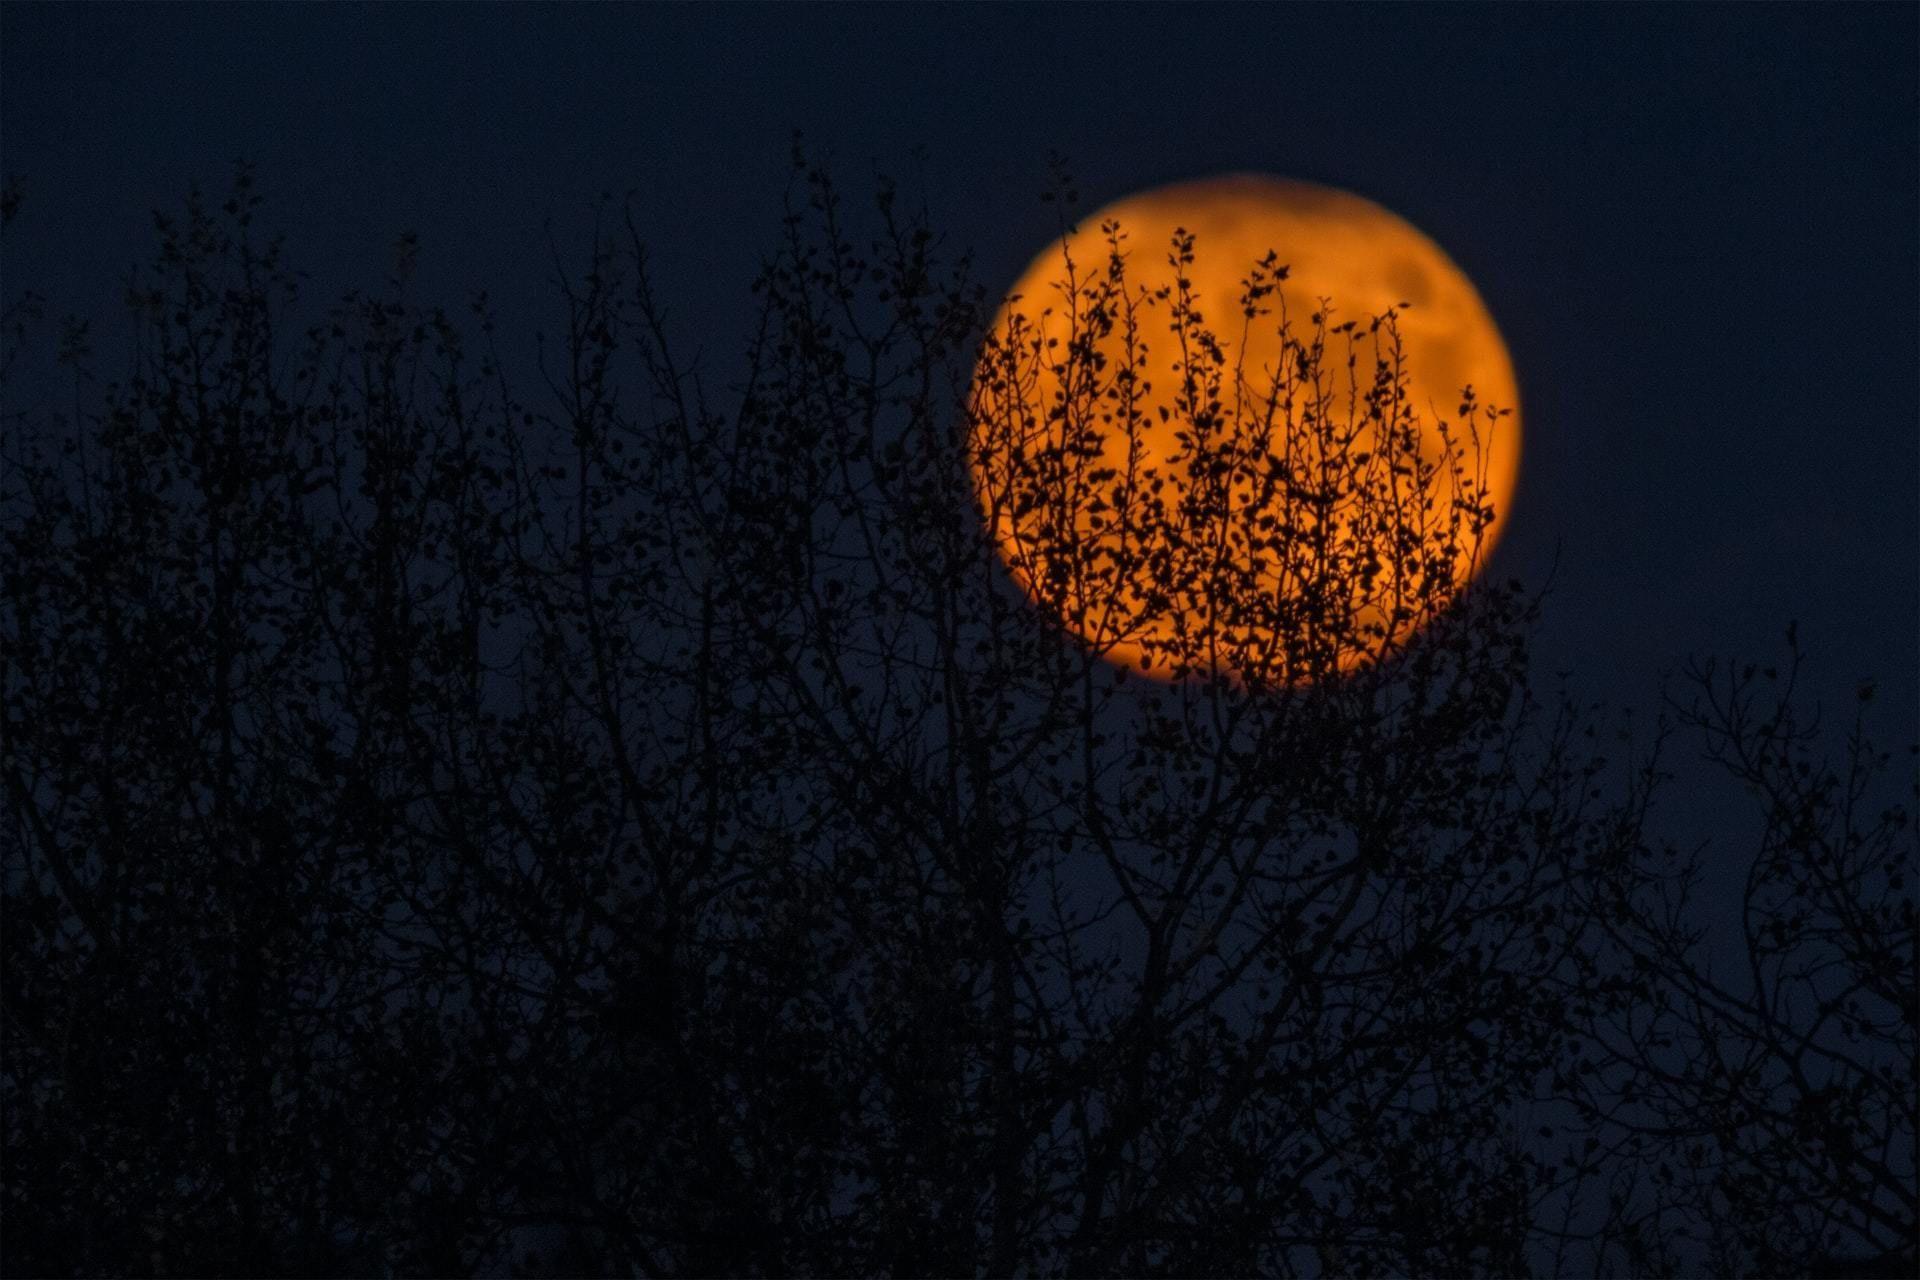 A deep dark night with an orange Halloween moon.